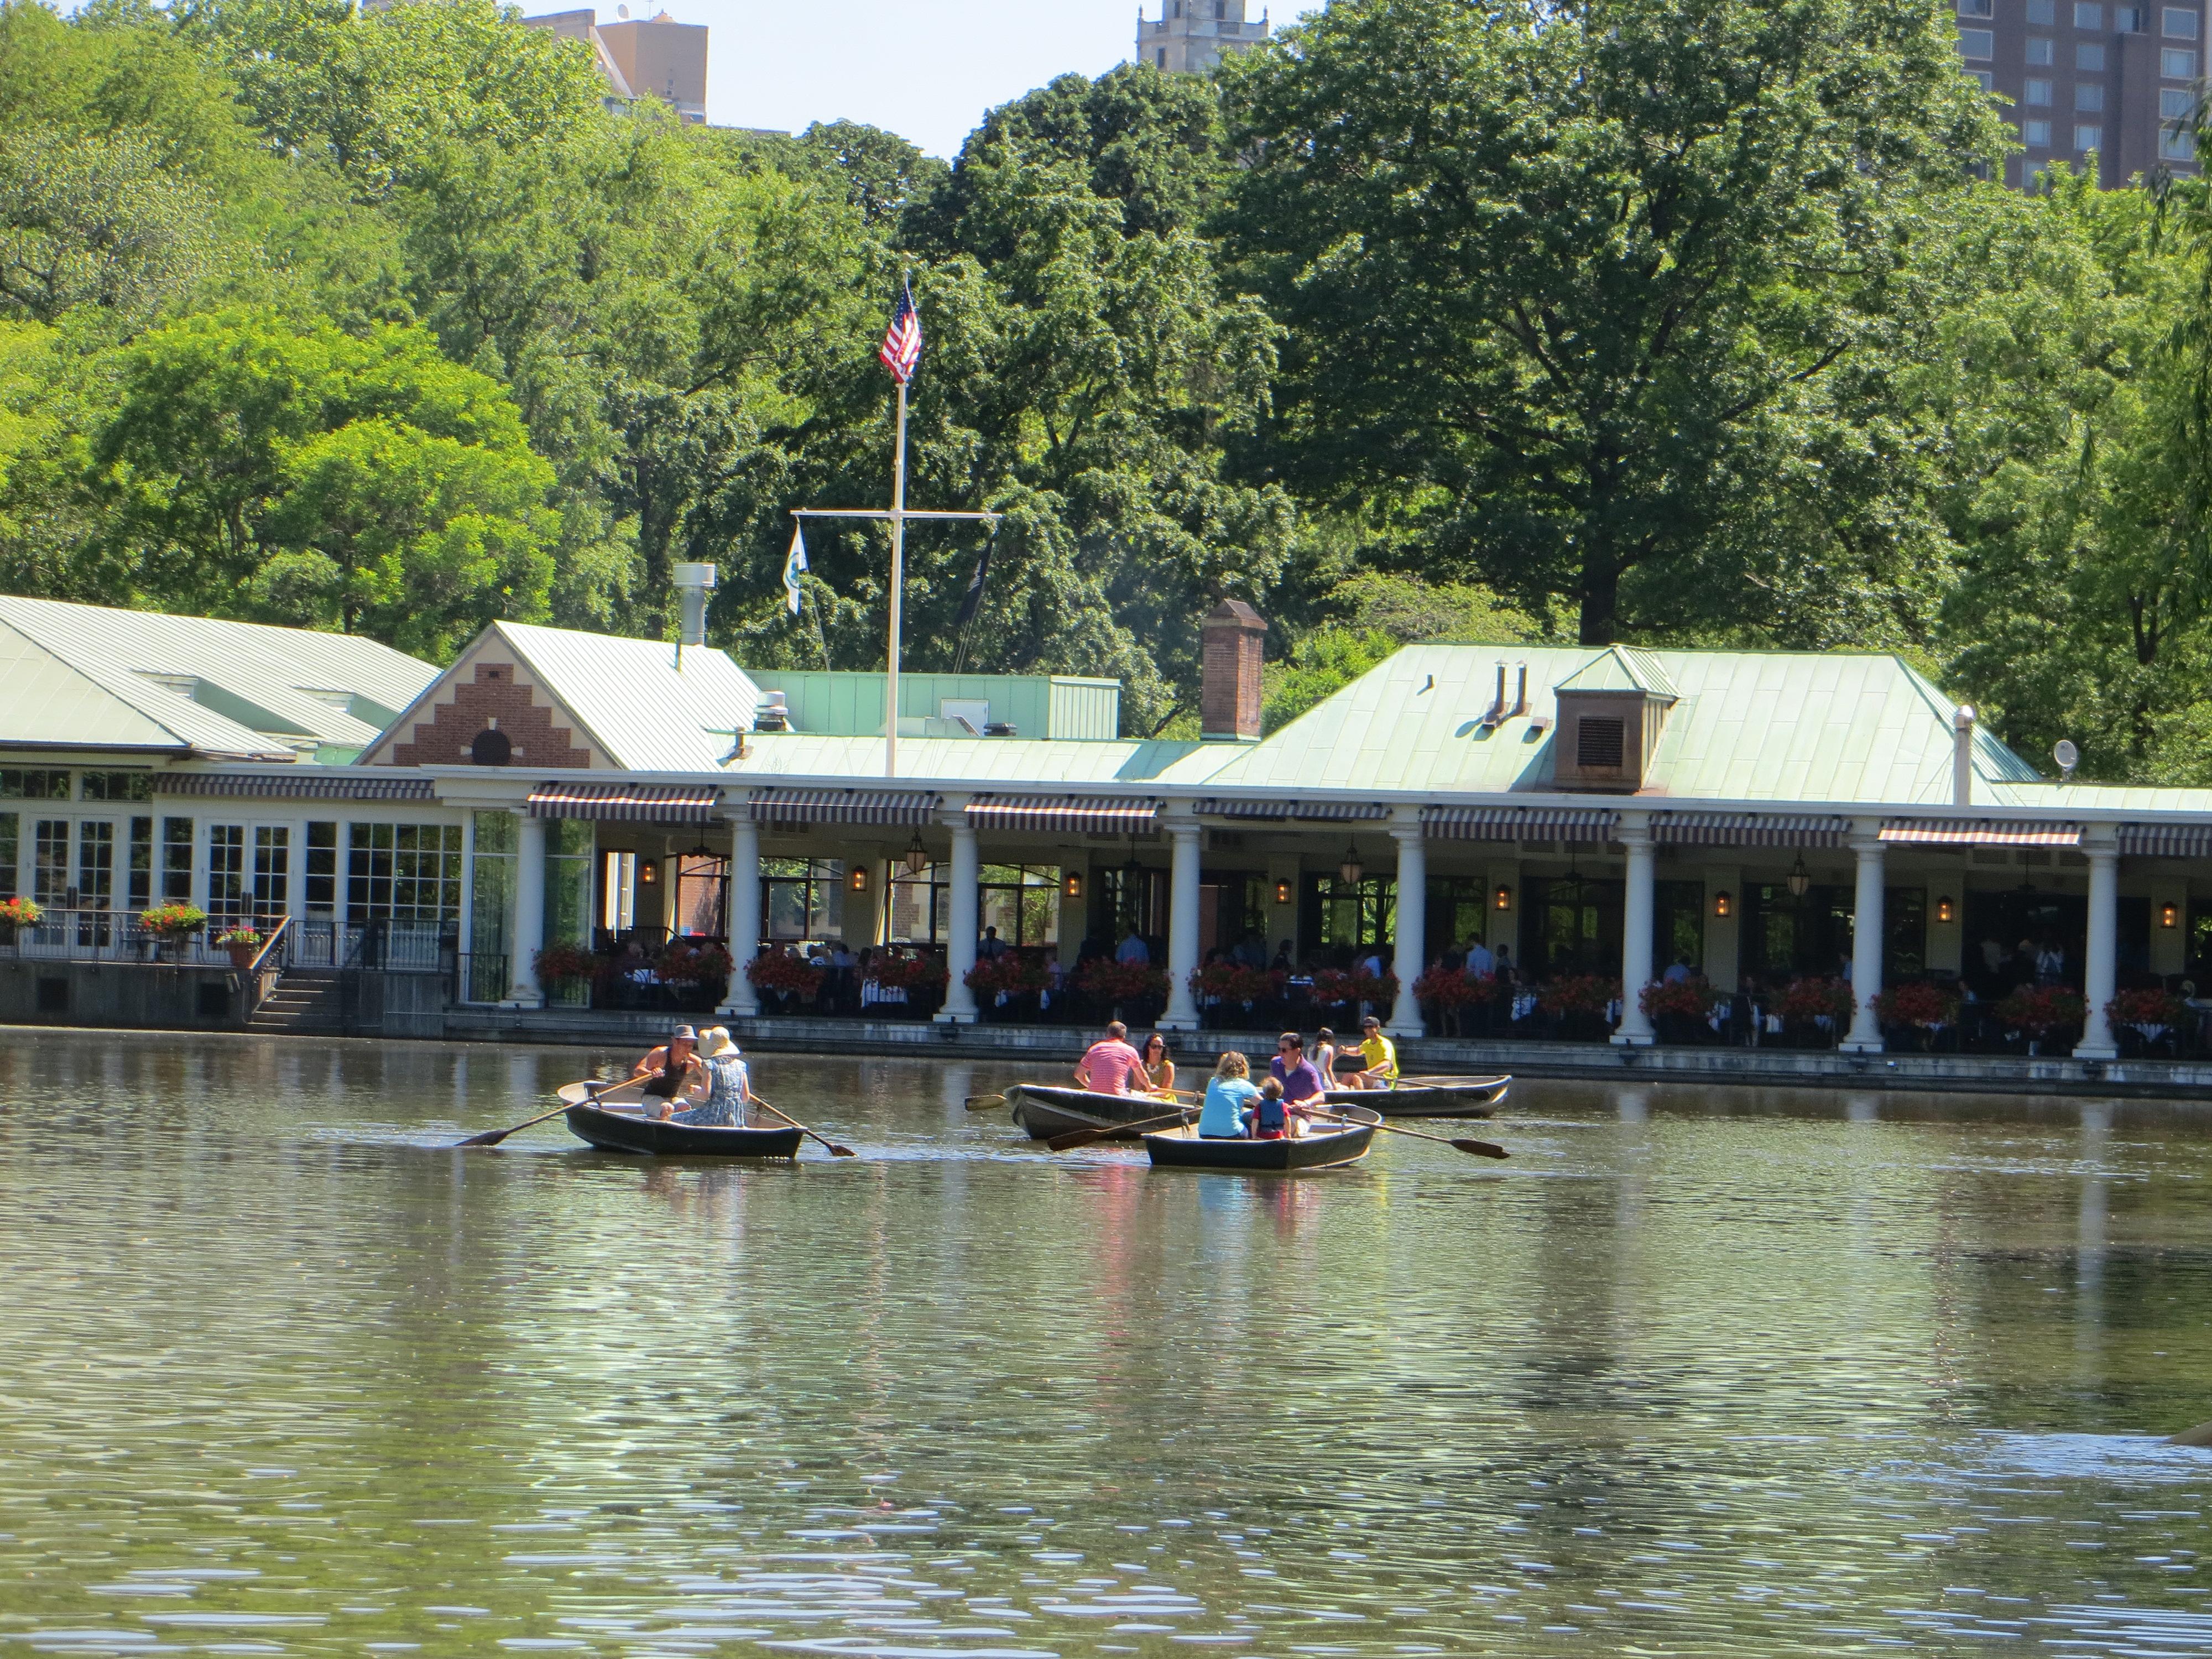 Central Park Boathouse Dress Code The Boathouse Central Park